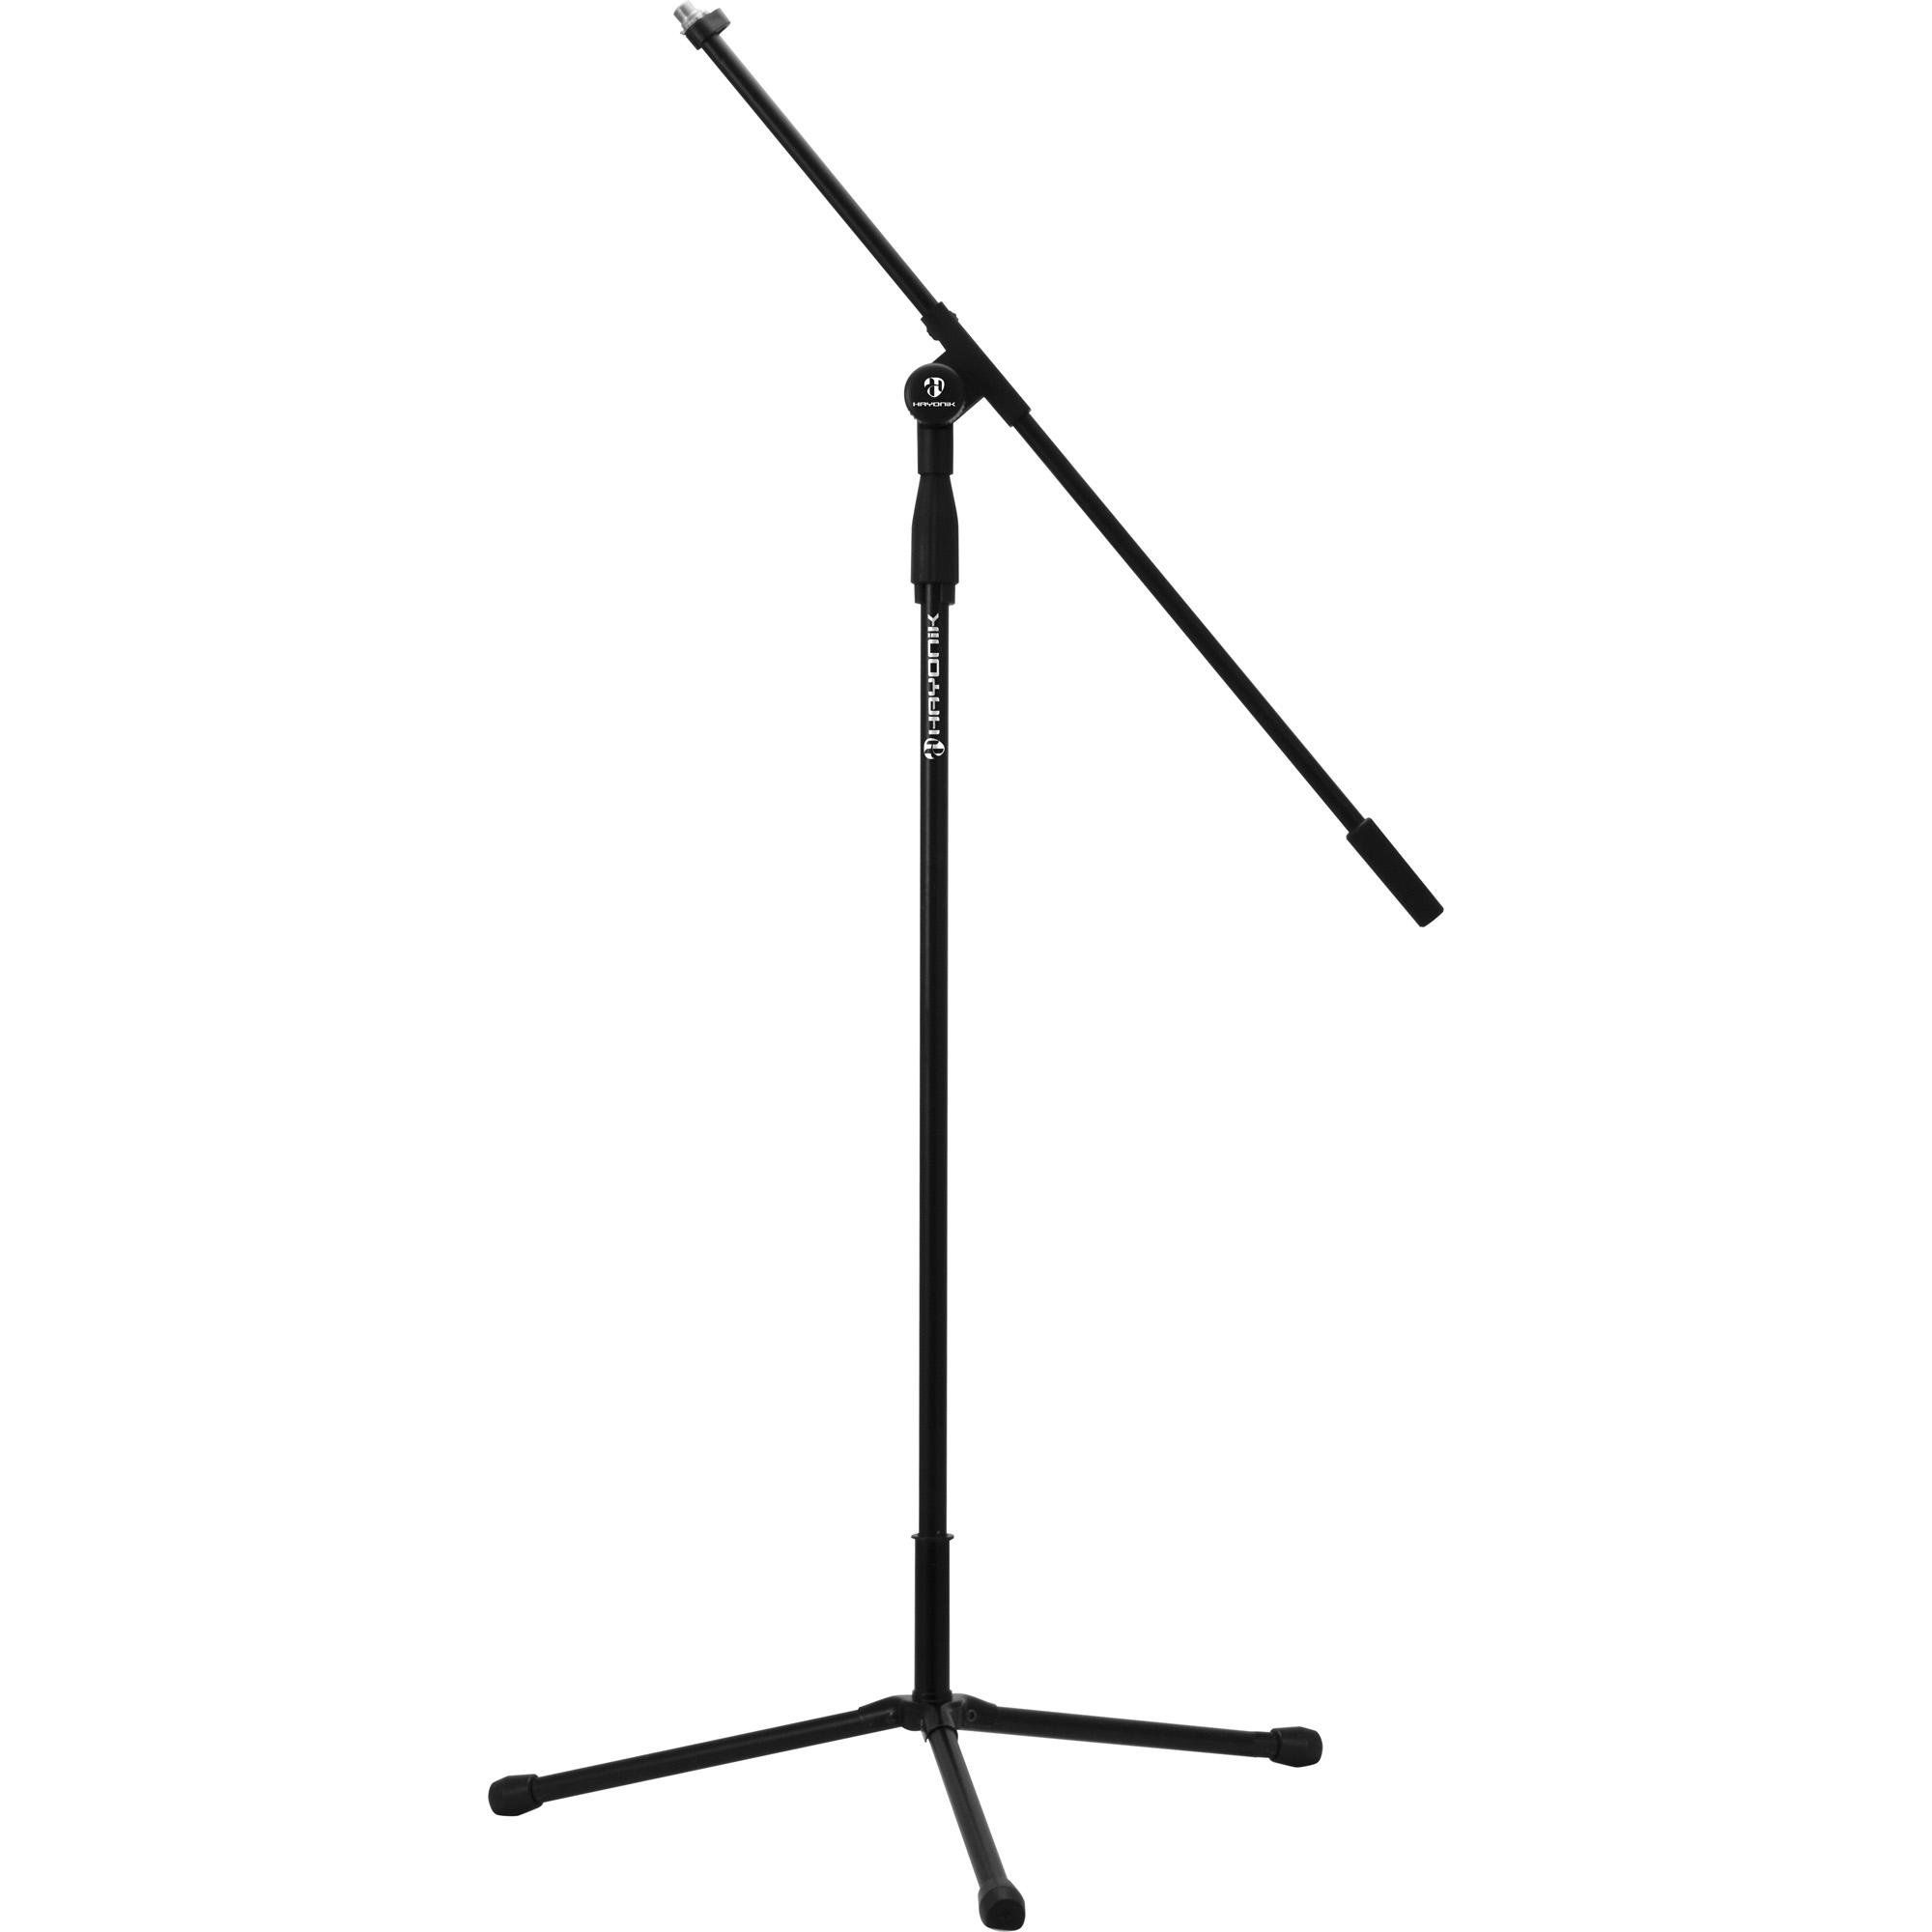 Suporte Pedestal para Microfone Tipo Girafa Preto HAYONIK PM-100